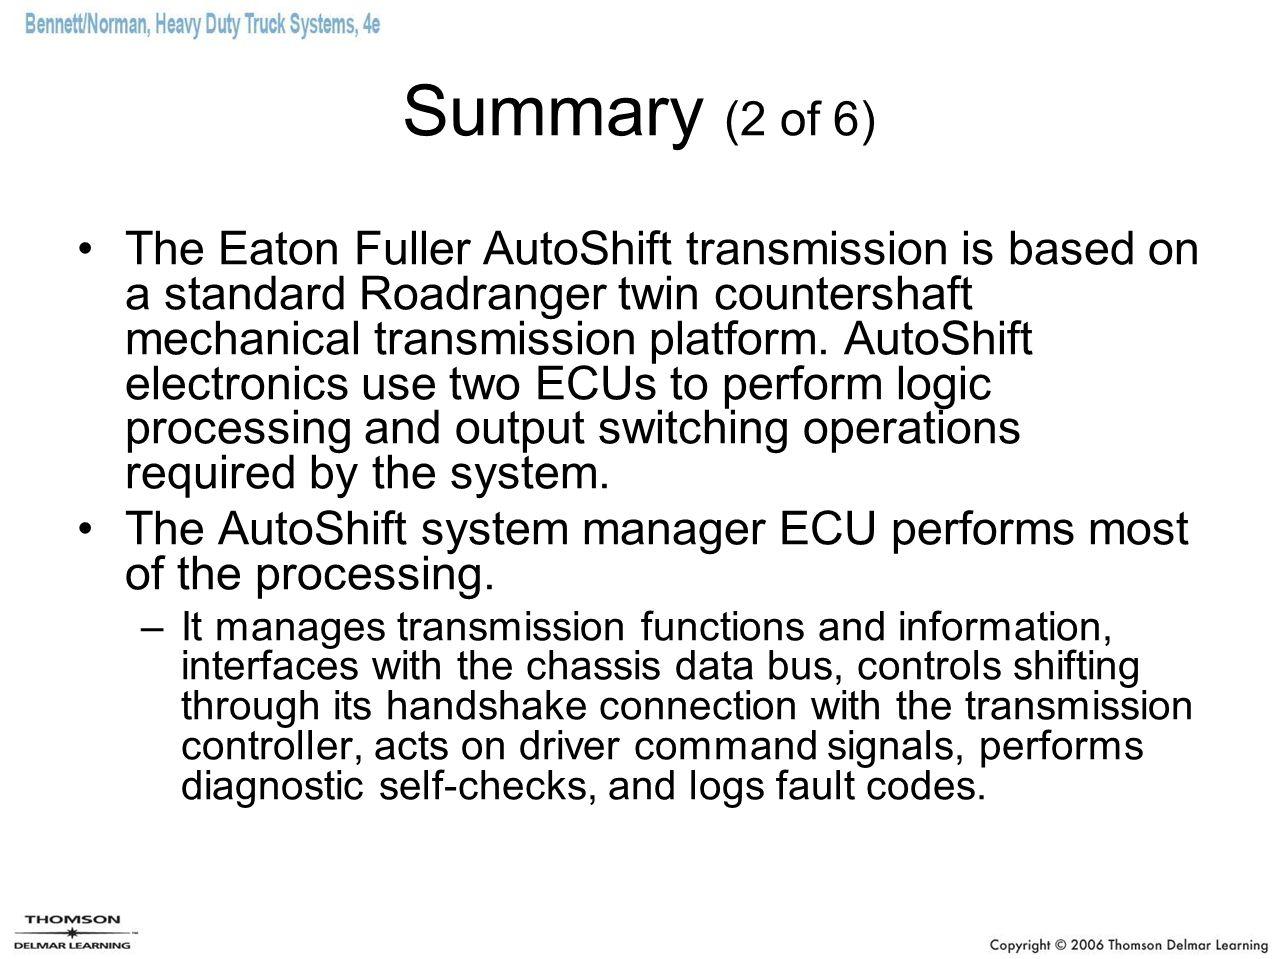 Summary (2 of 6) The Eaton Fuller AutoShift transmission is based on a standard Roadranger twin countershaft mechanical transmission platform. AutoShi